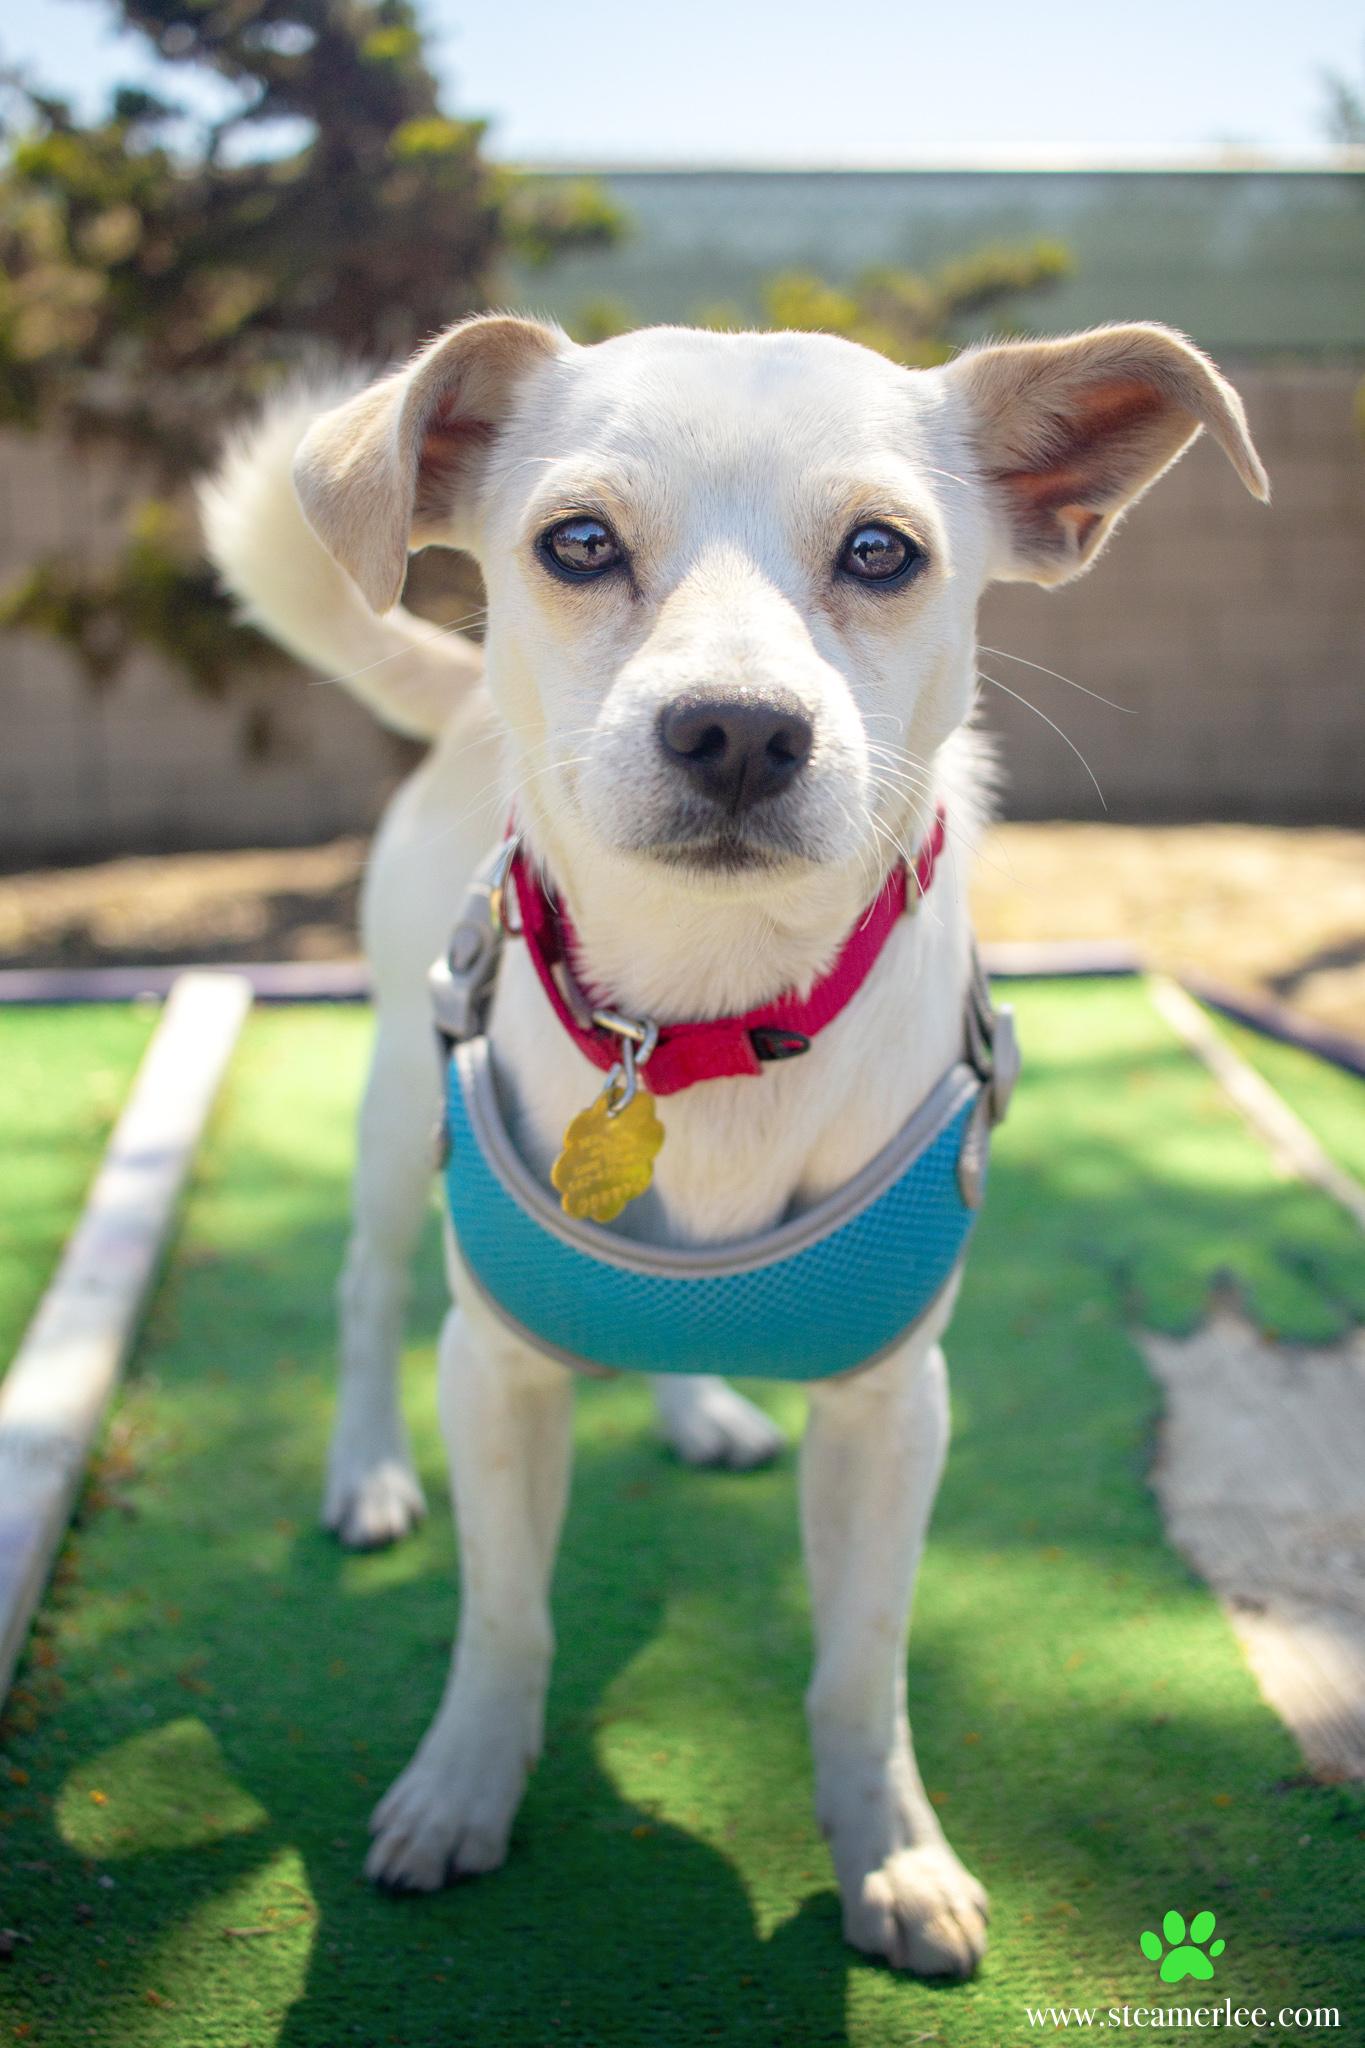 288-Orange-County-Dog-Photography-Steamer-Lee-Southern-California-SBACC.JPG